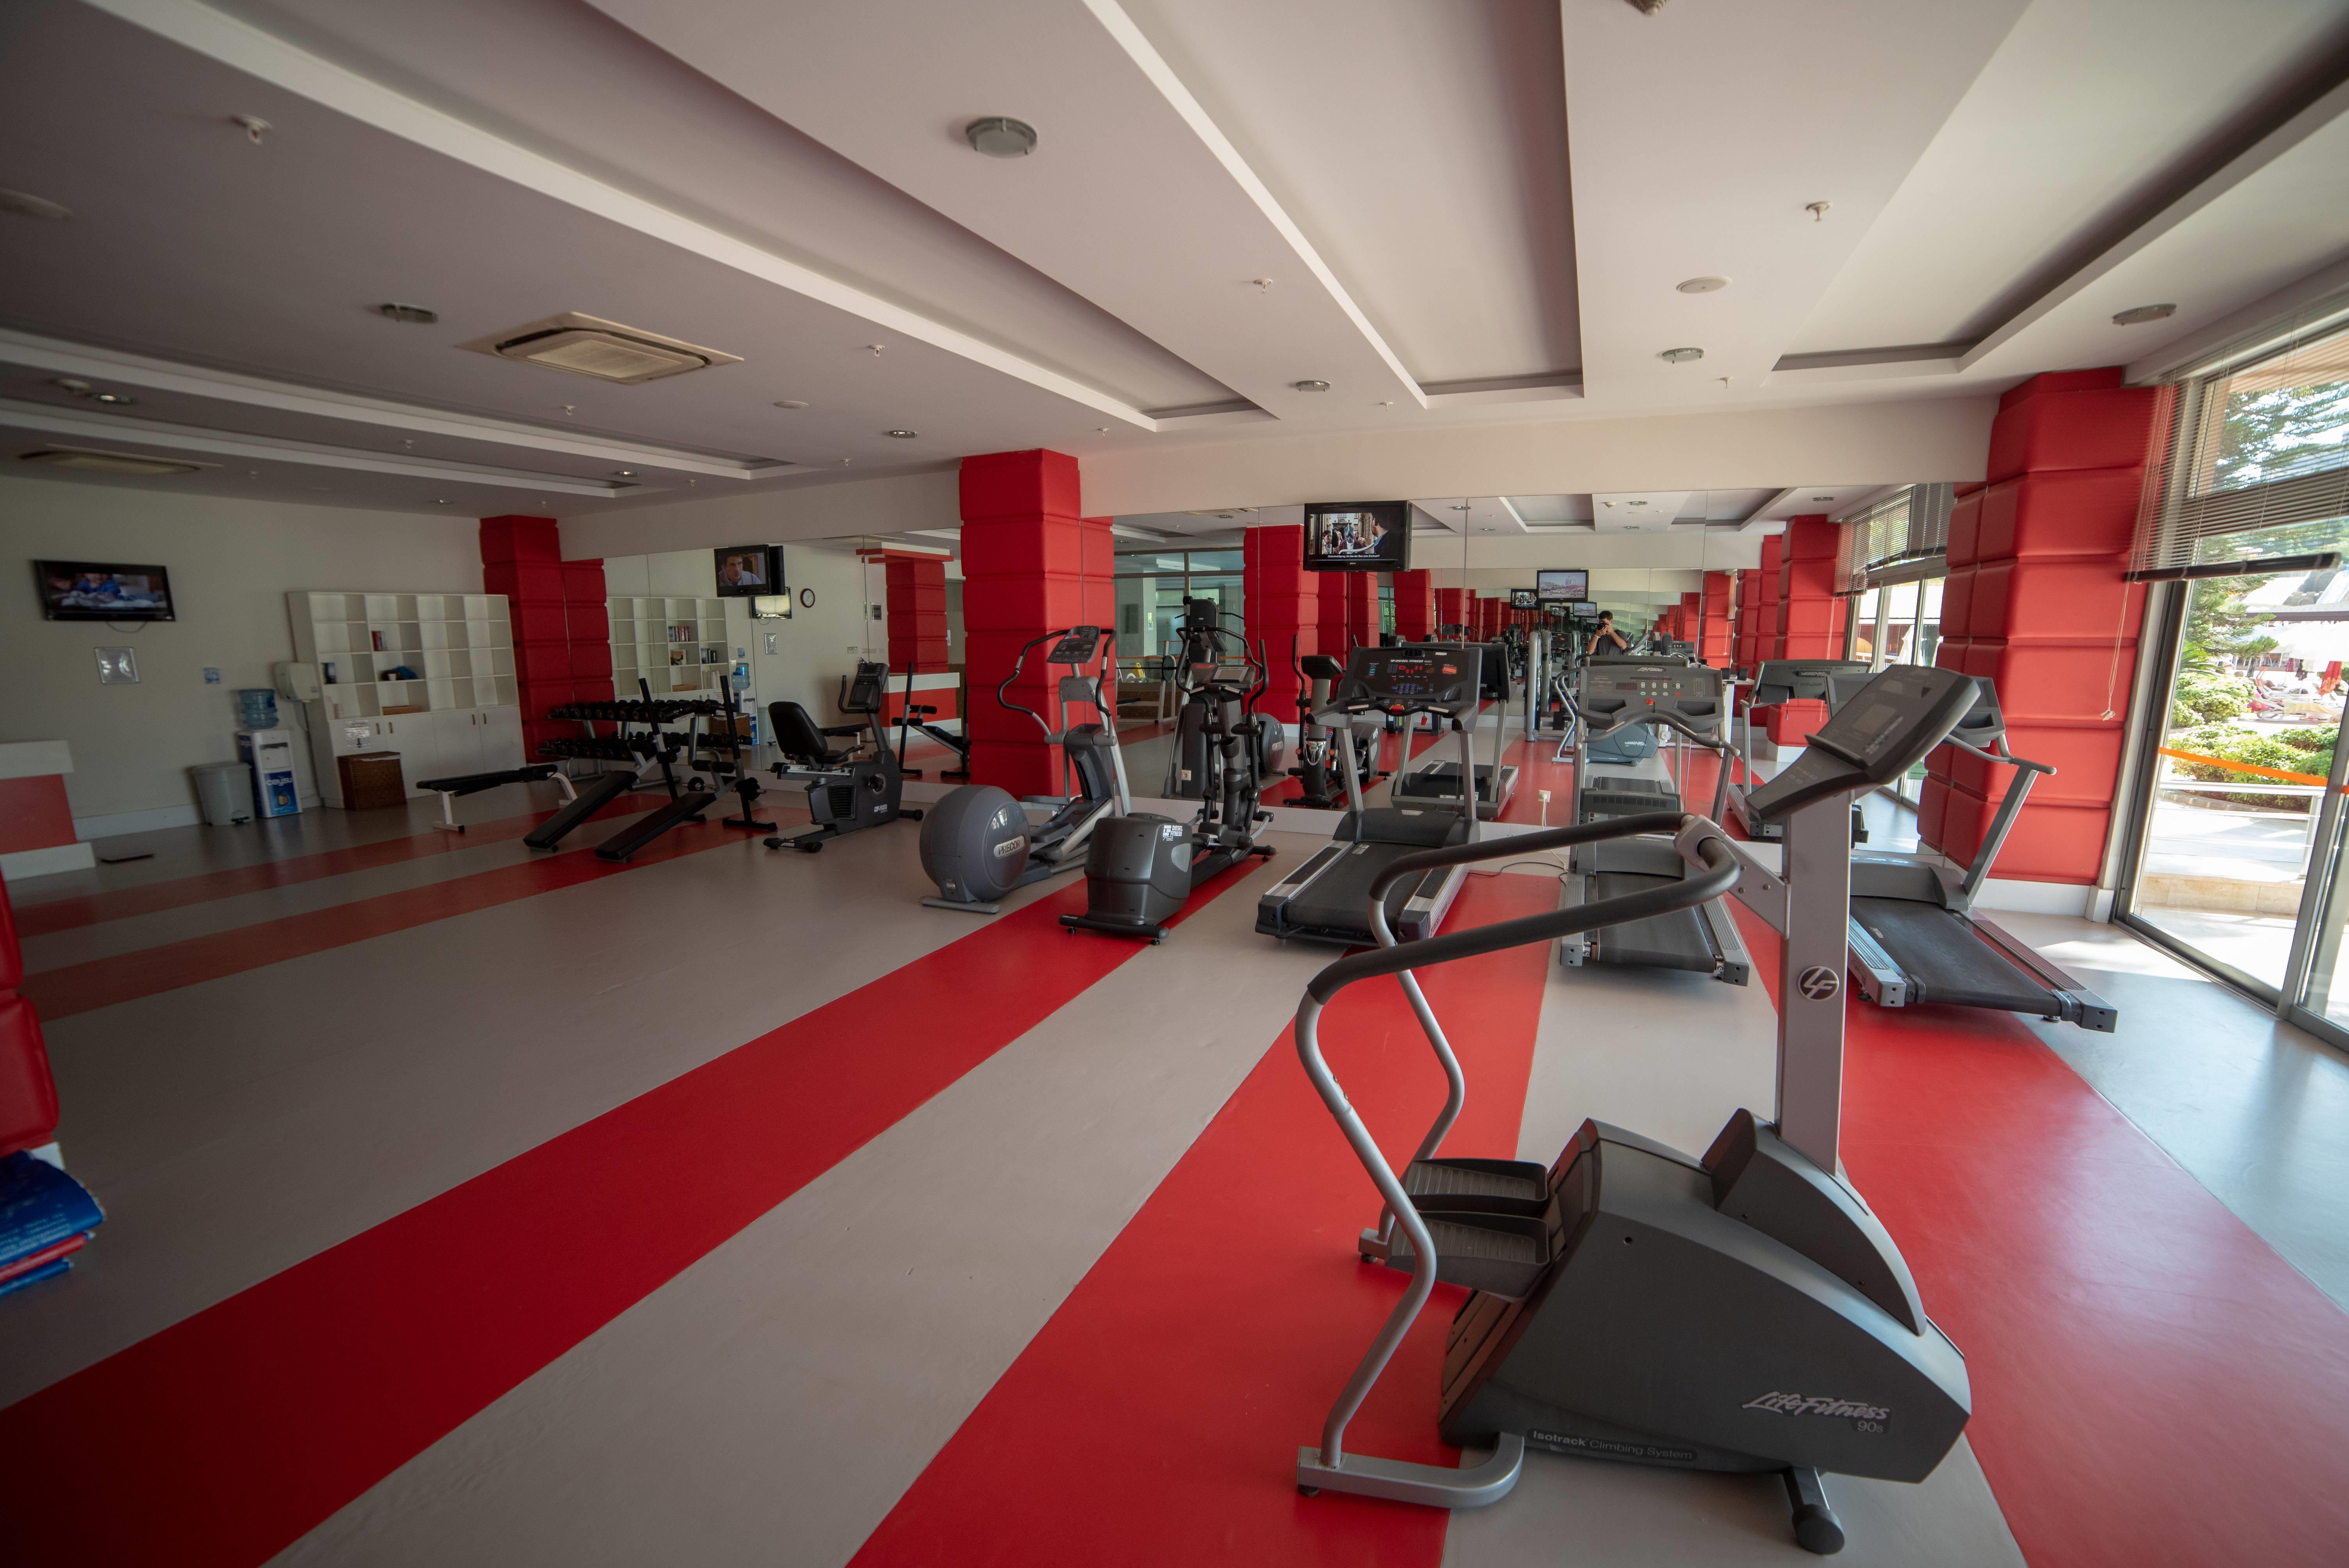 Arycanda De Luxe 5˙ - fitnescentrum